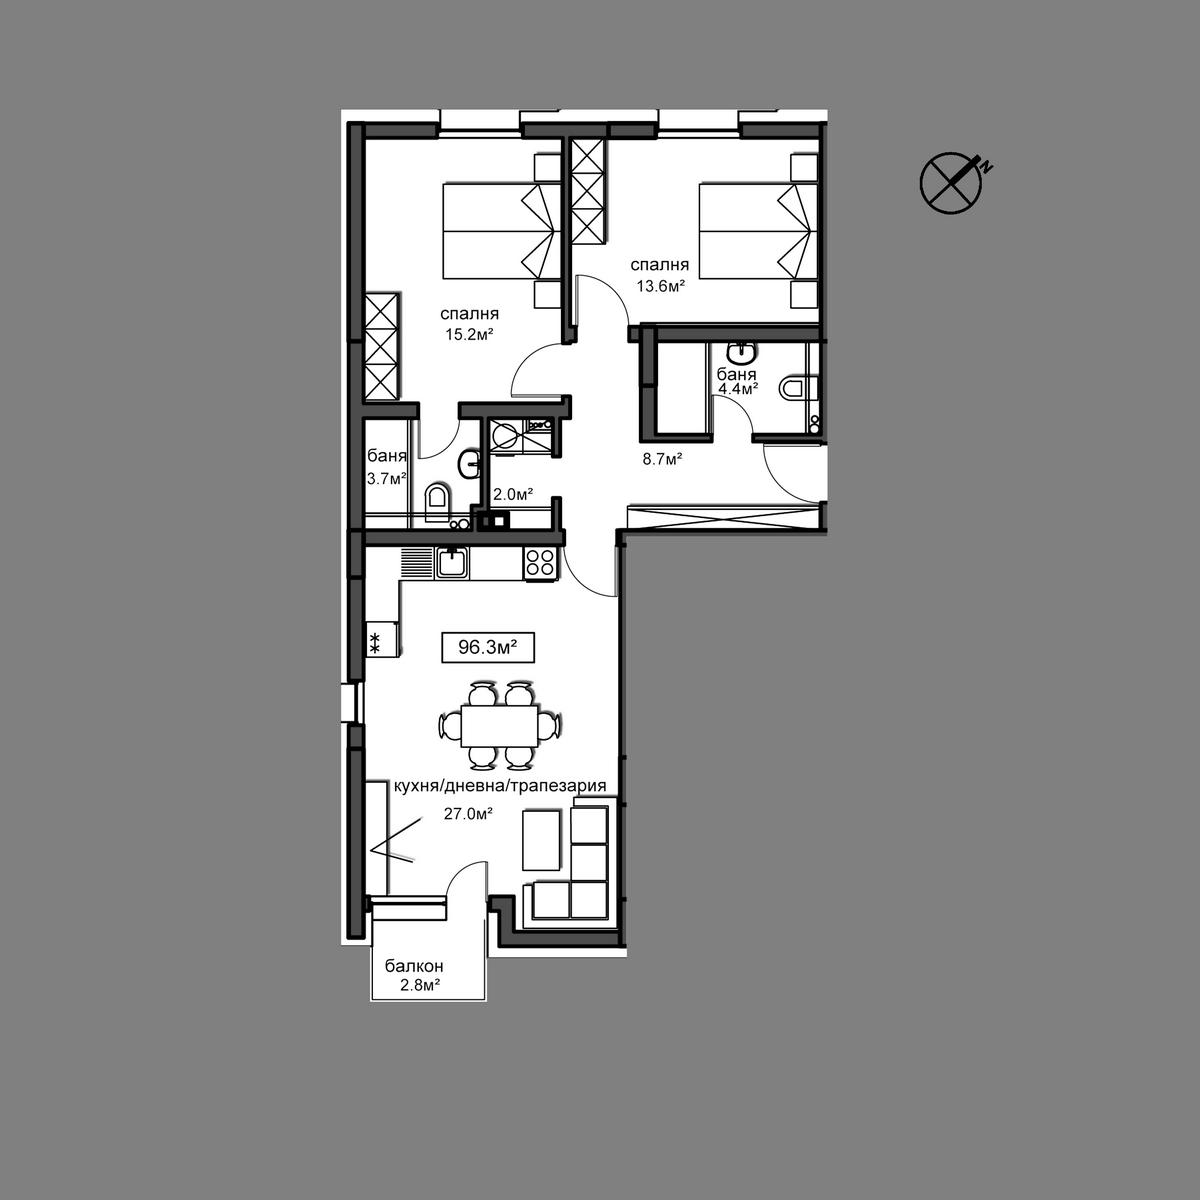 Продава апартамент ново строителство - Апартамент А13